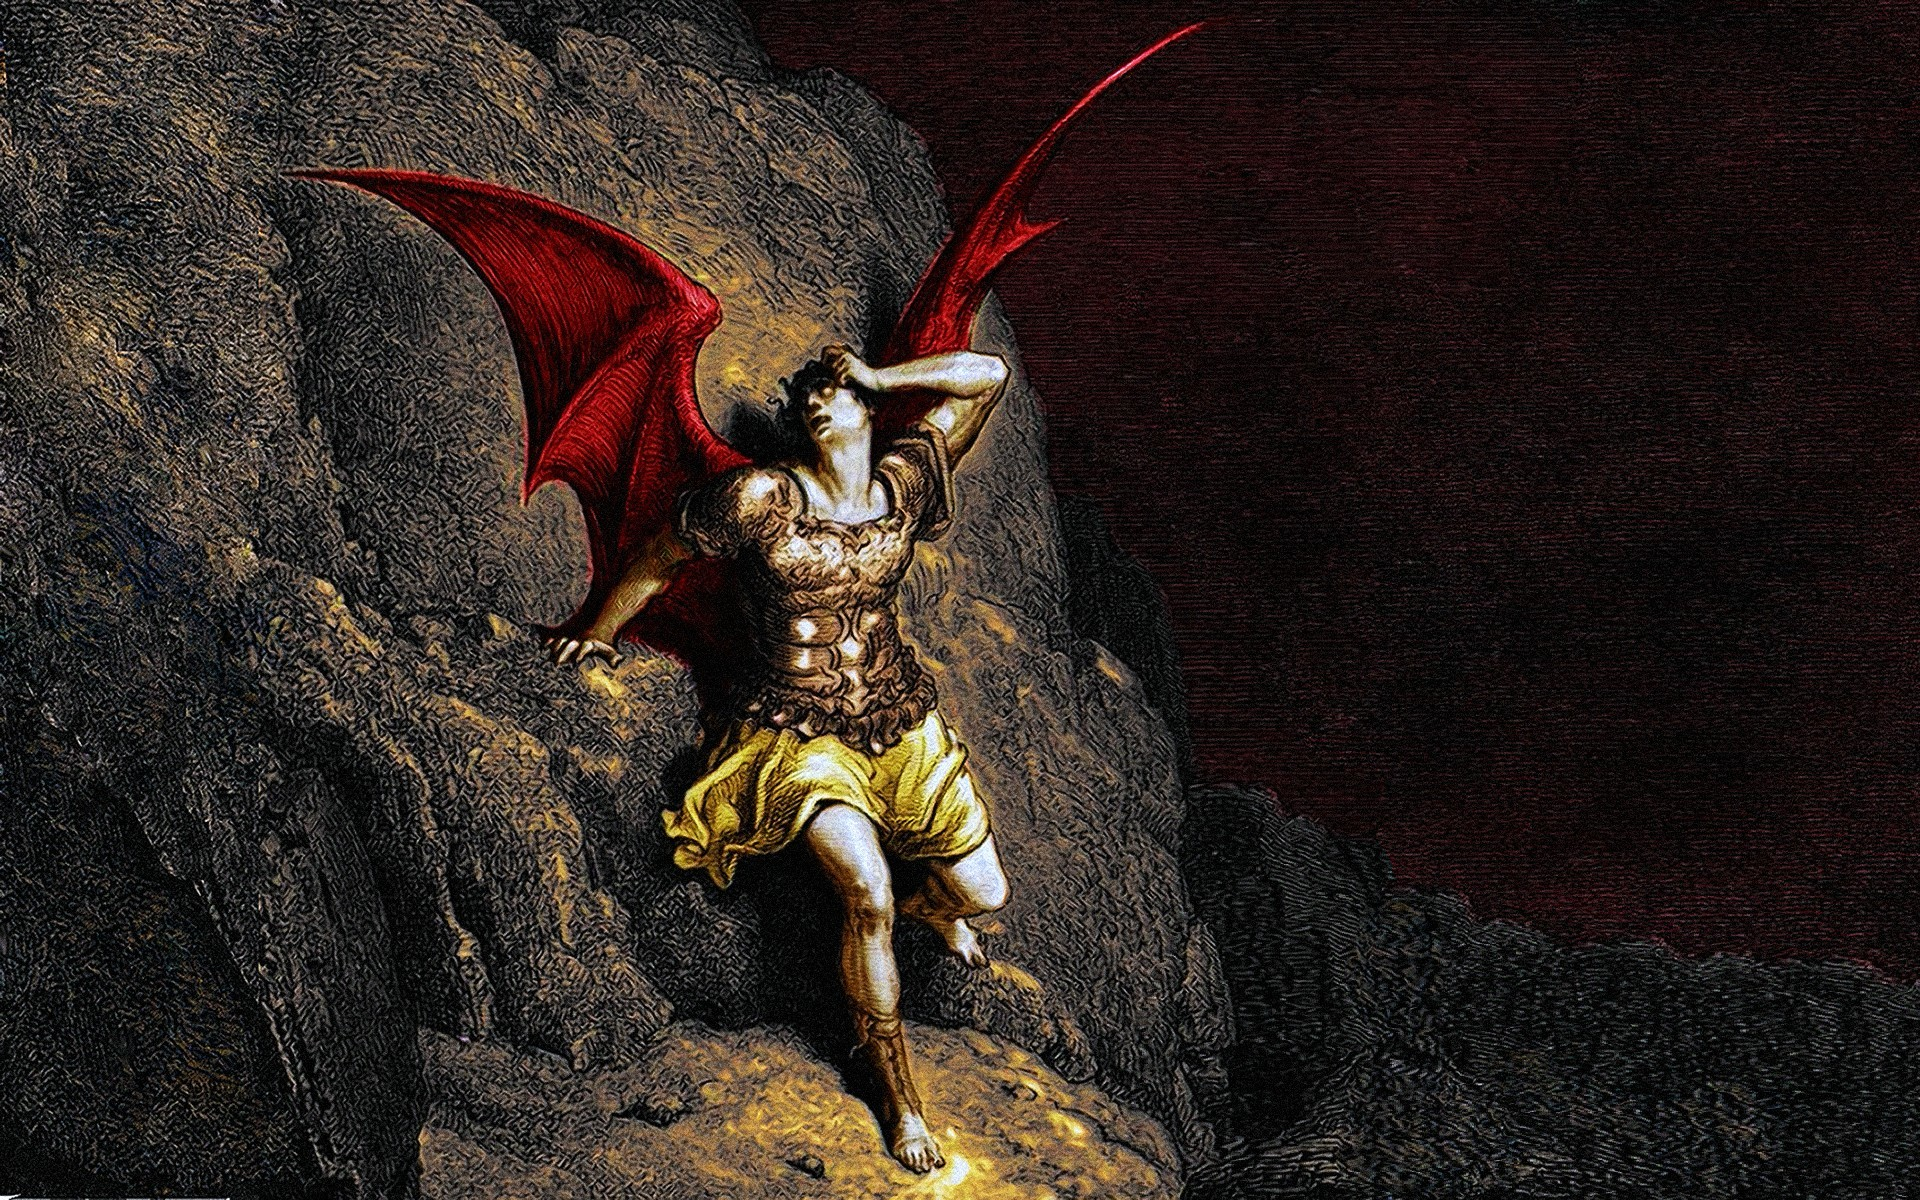 hell heaven satan demonic lucifer satanic demon wallpaper background .